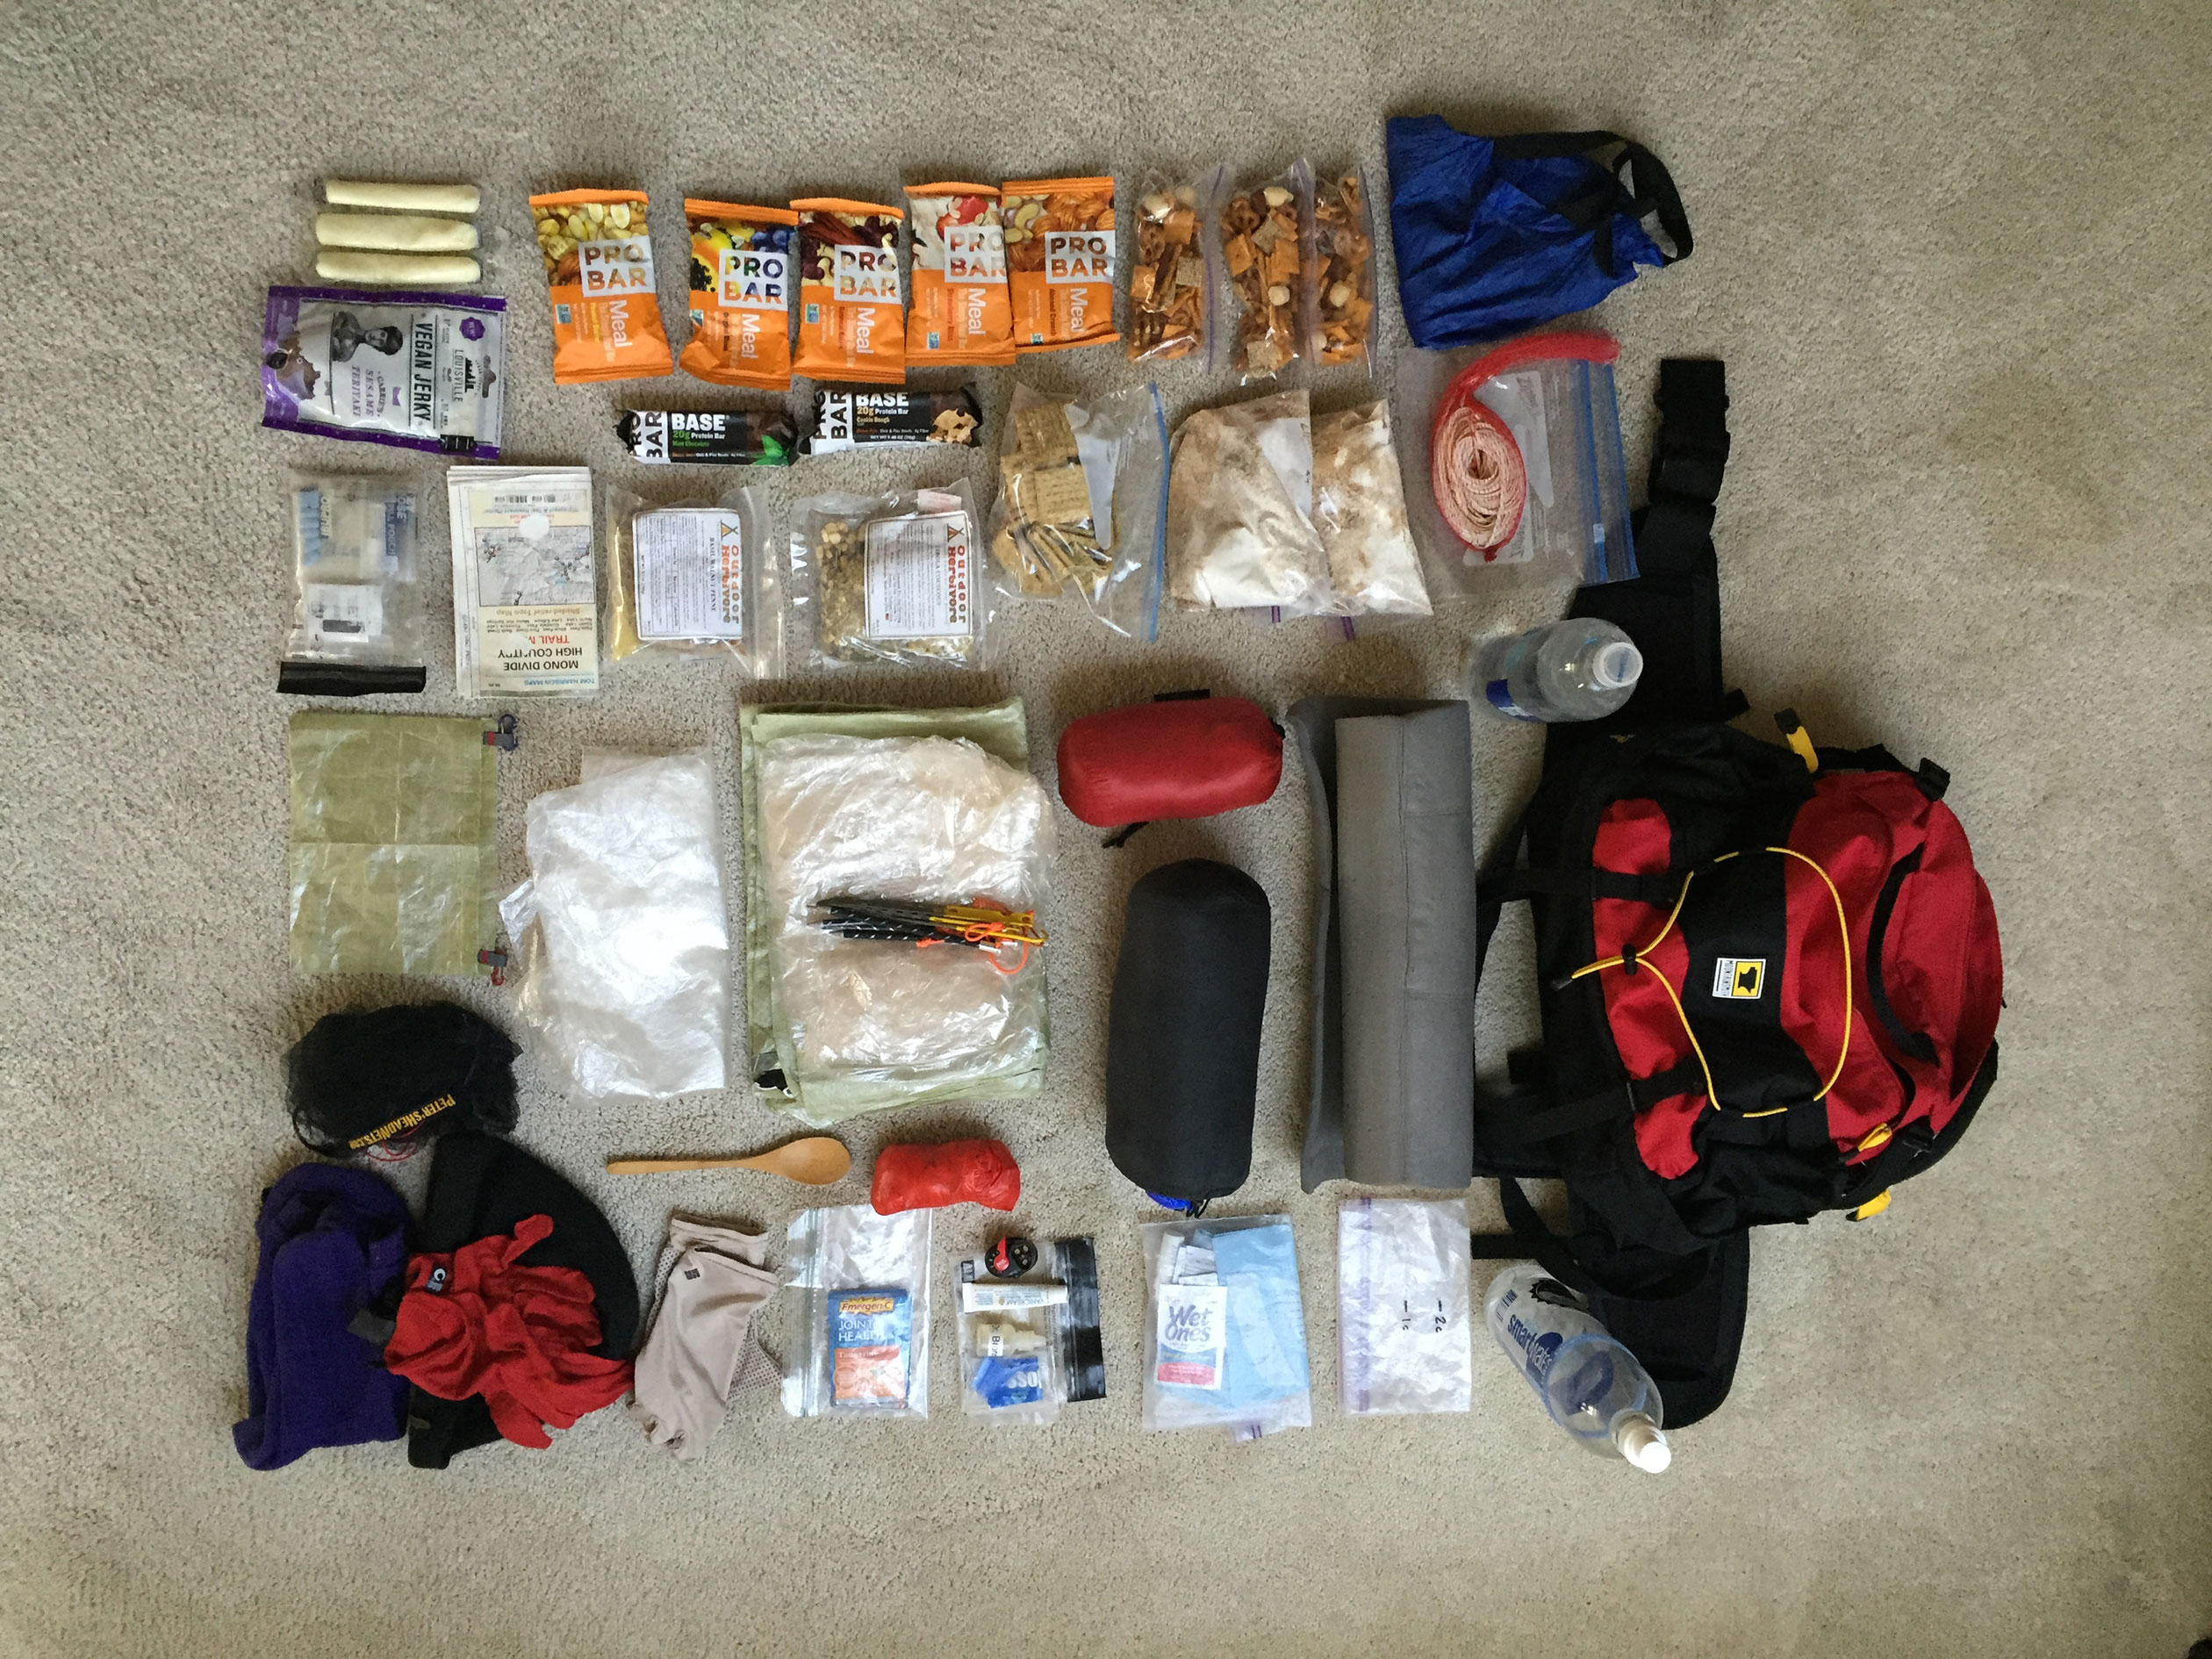 layout of mountainsmith day pack with glen van peski